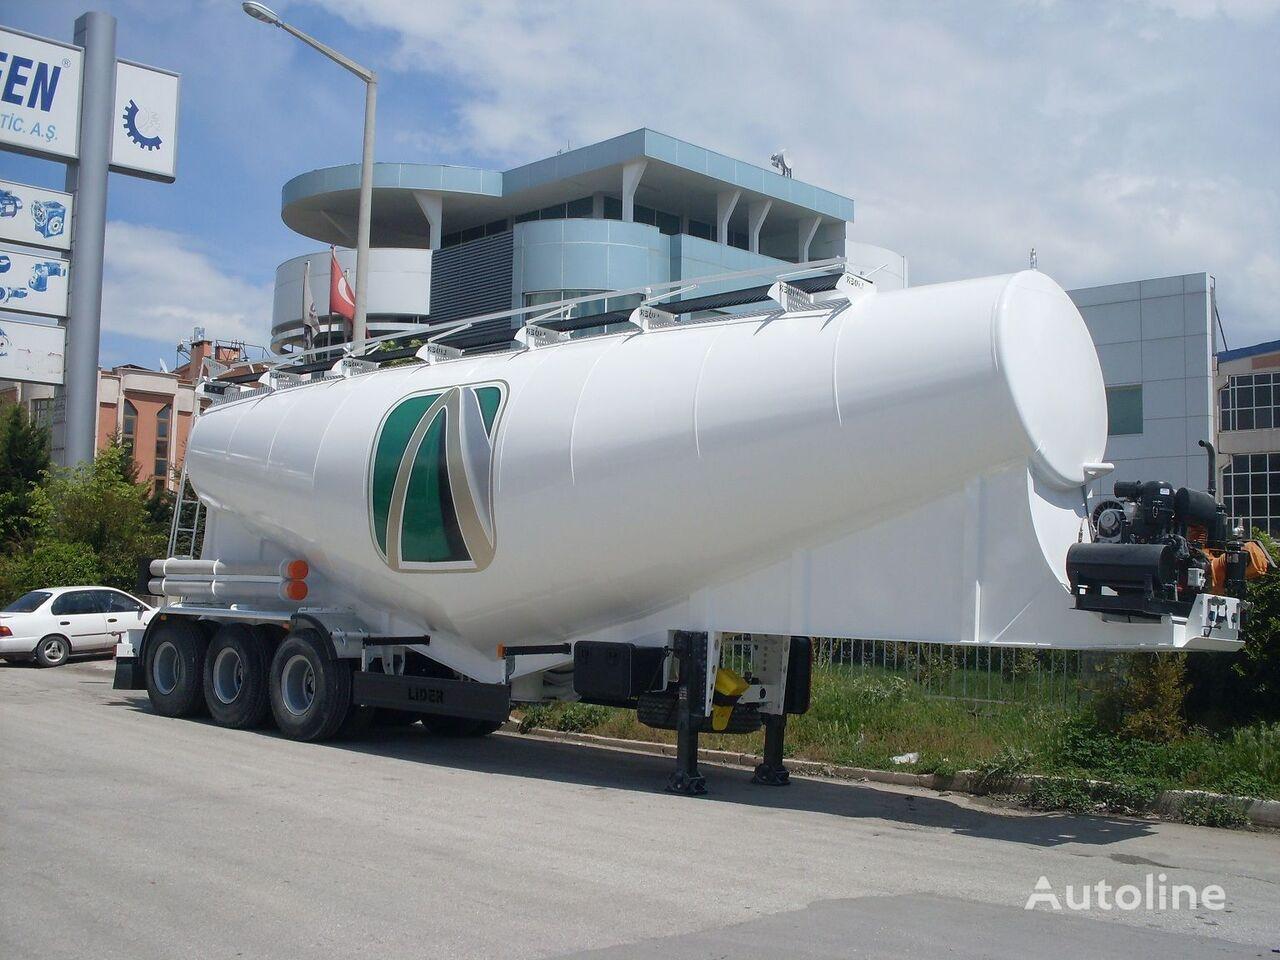 nieuw LIDER بلكر اسمنت مواصفات اوربية 2018 cement tank